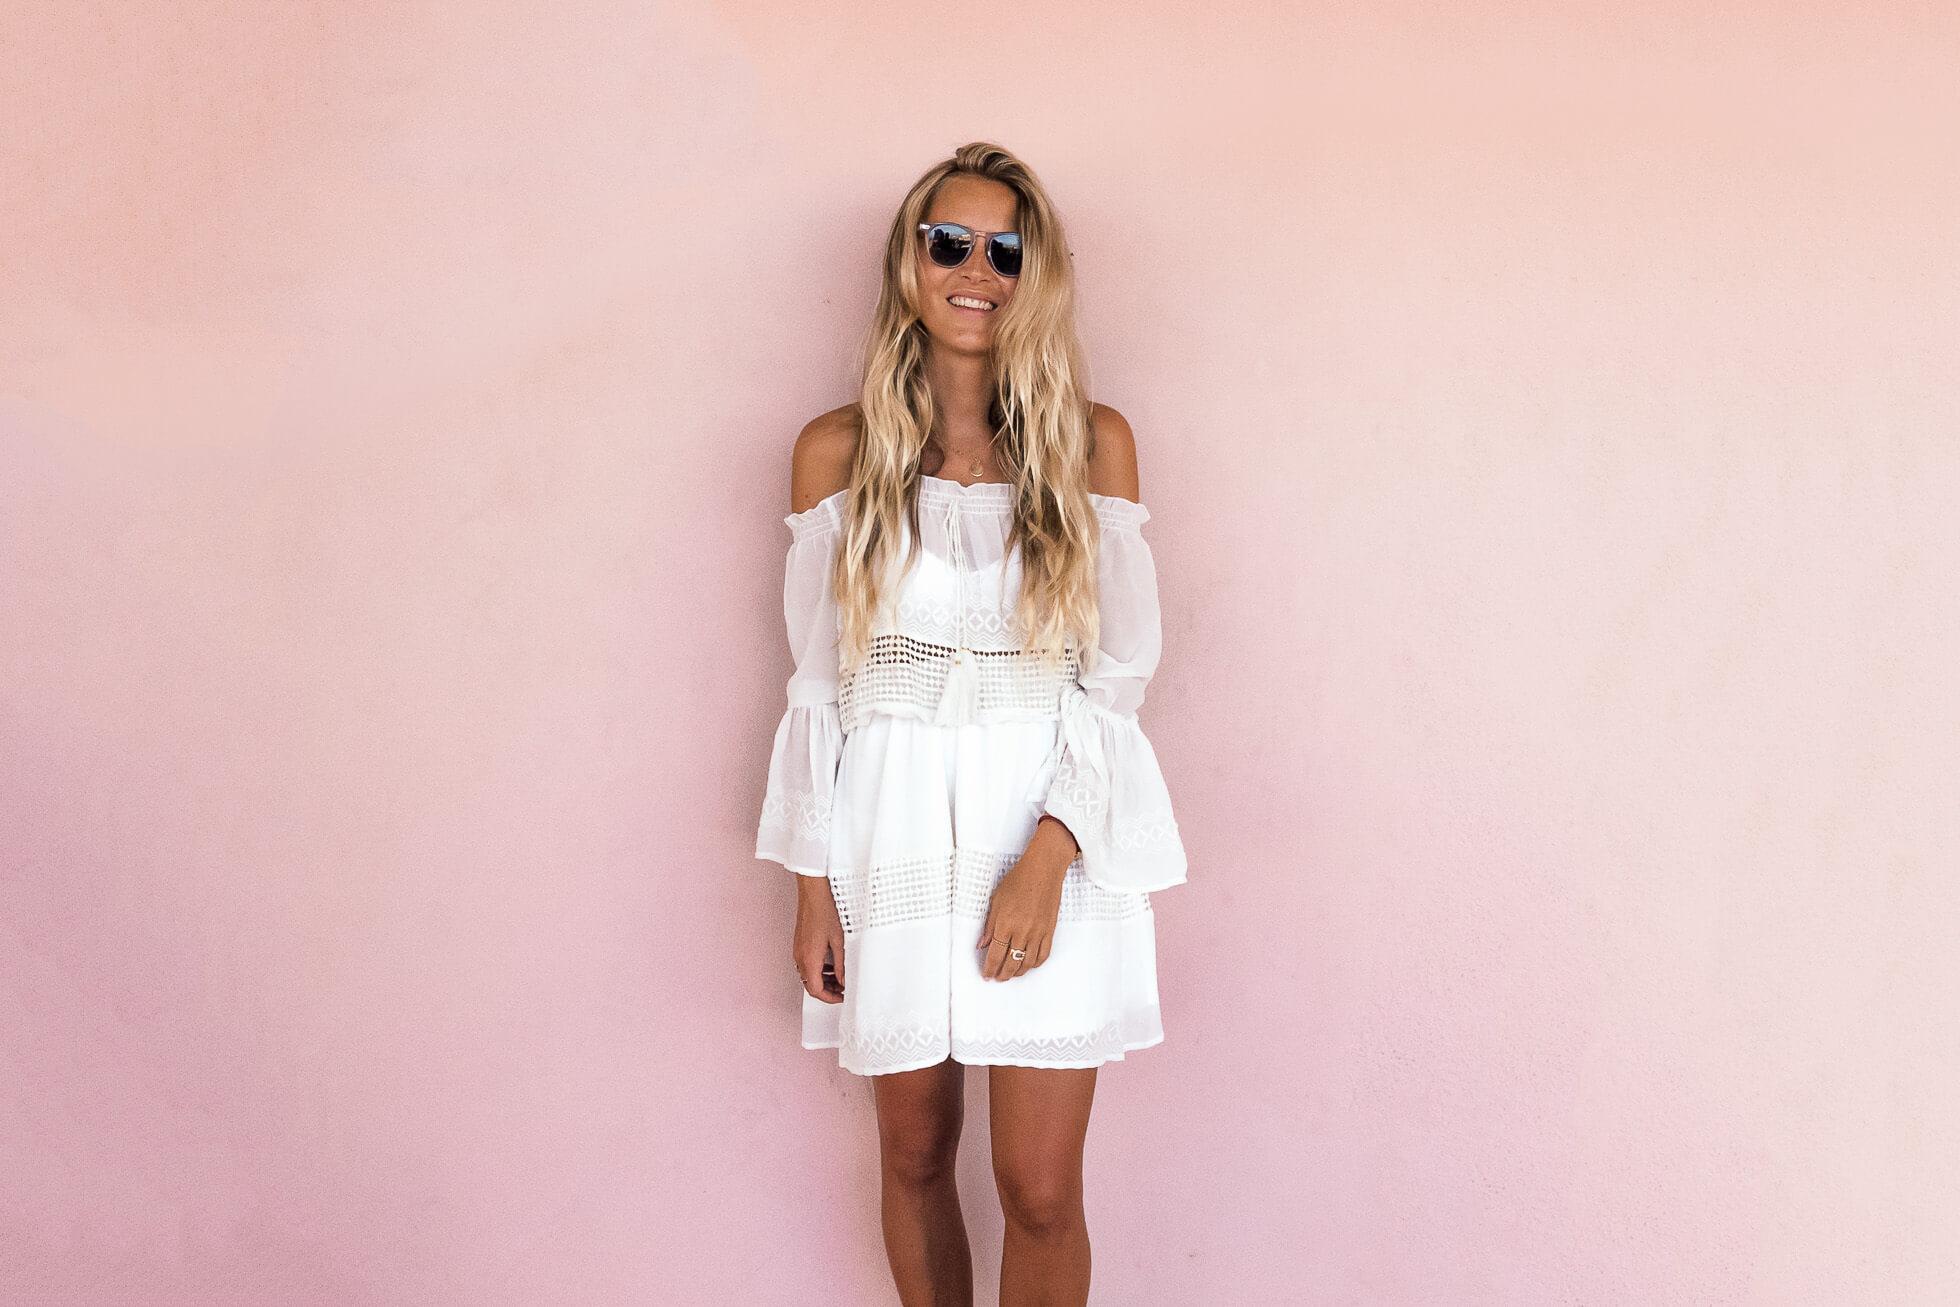 janni-deler-pink-wallsJ1130469-Redigera